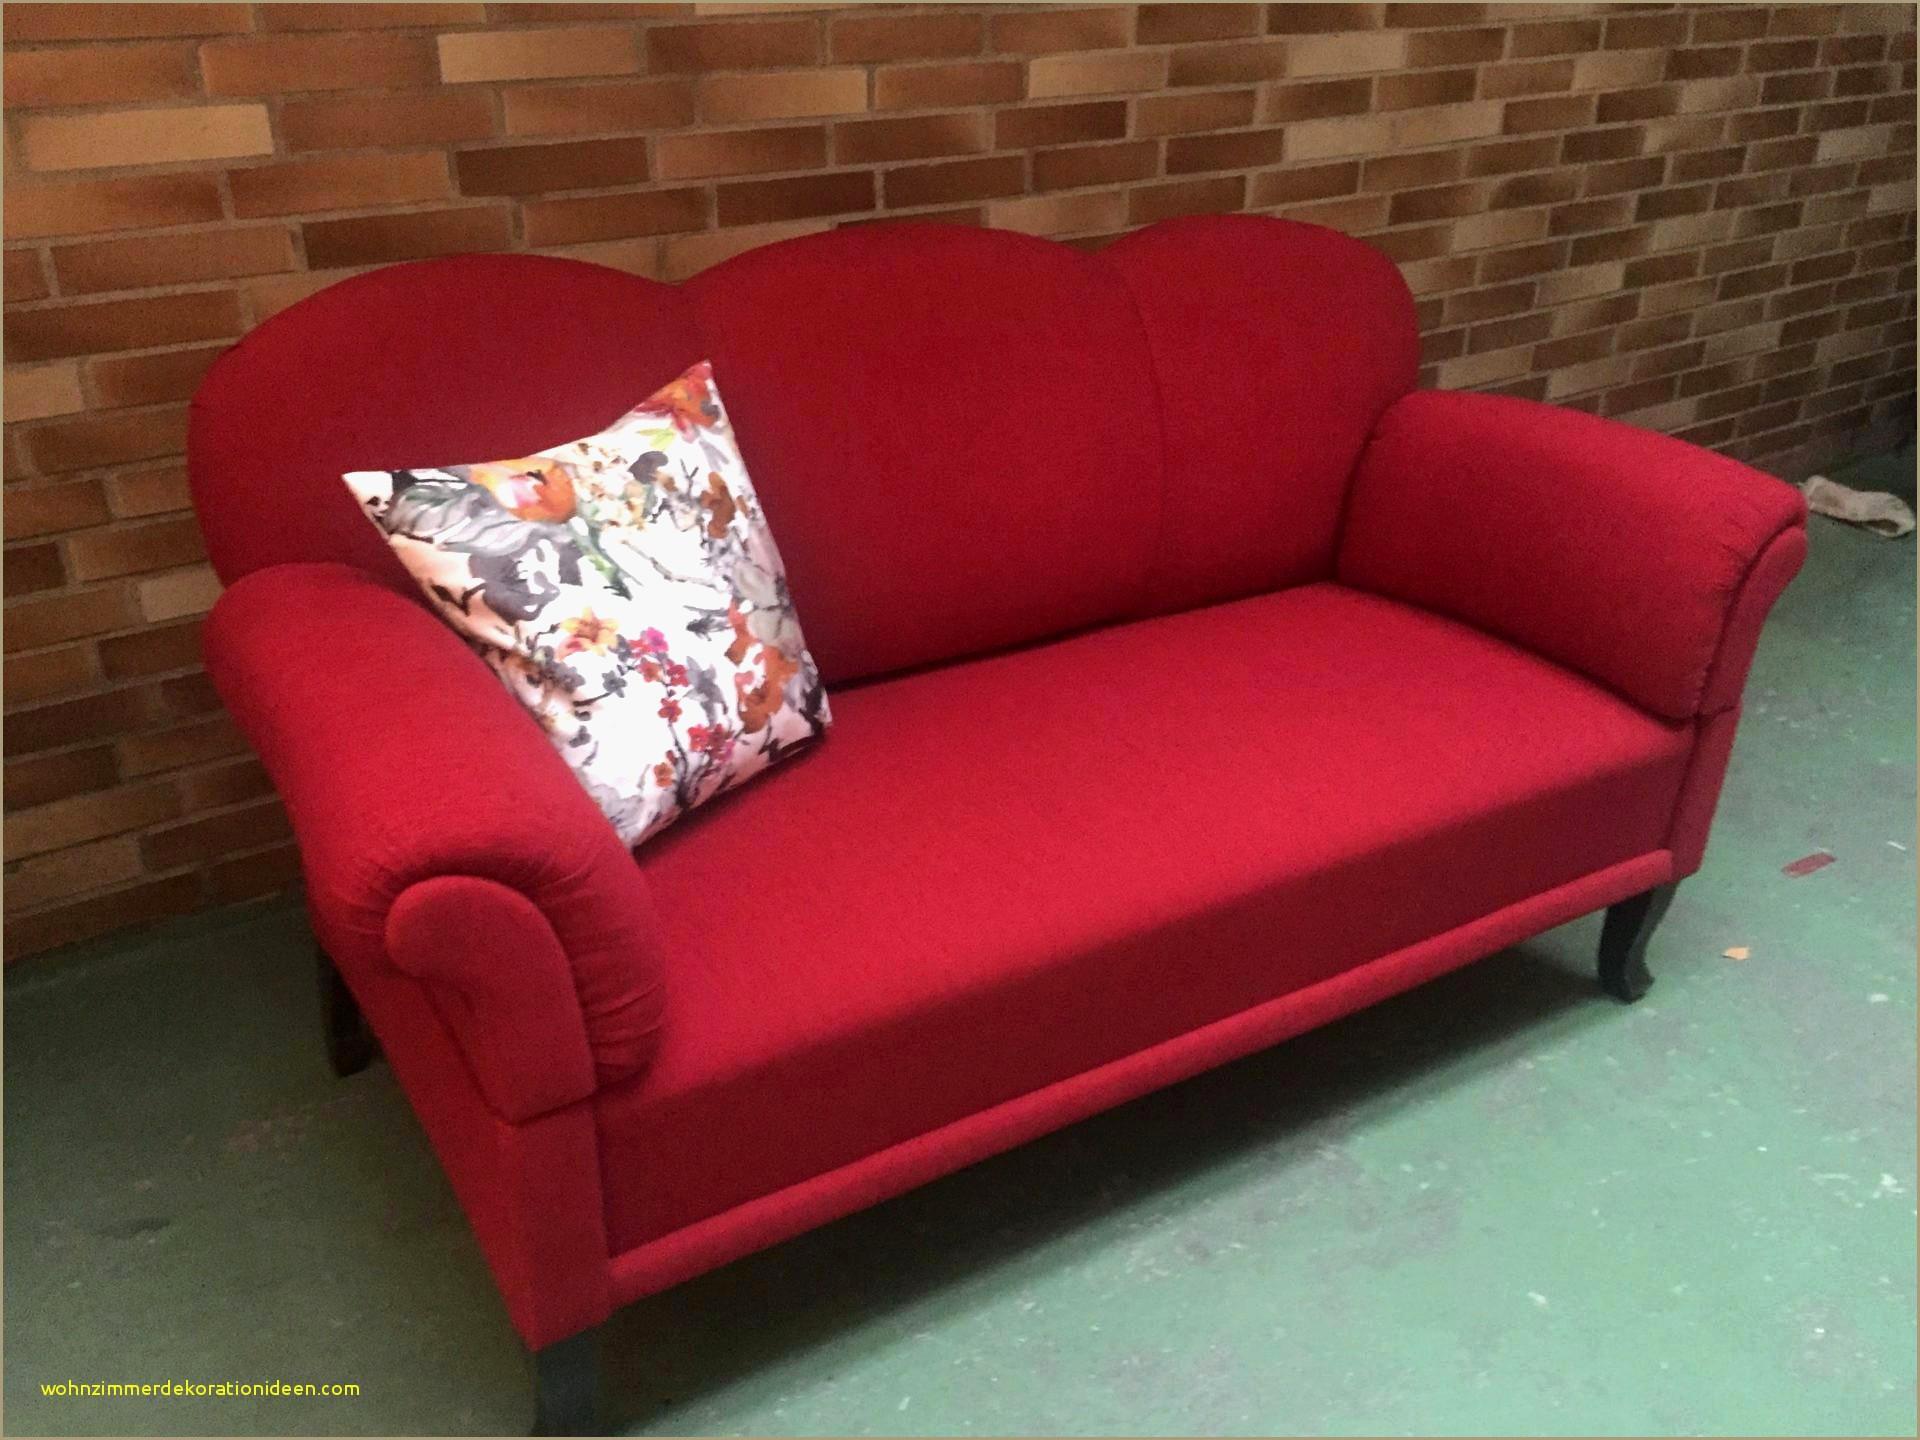 Das Rote Sofa Heute